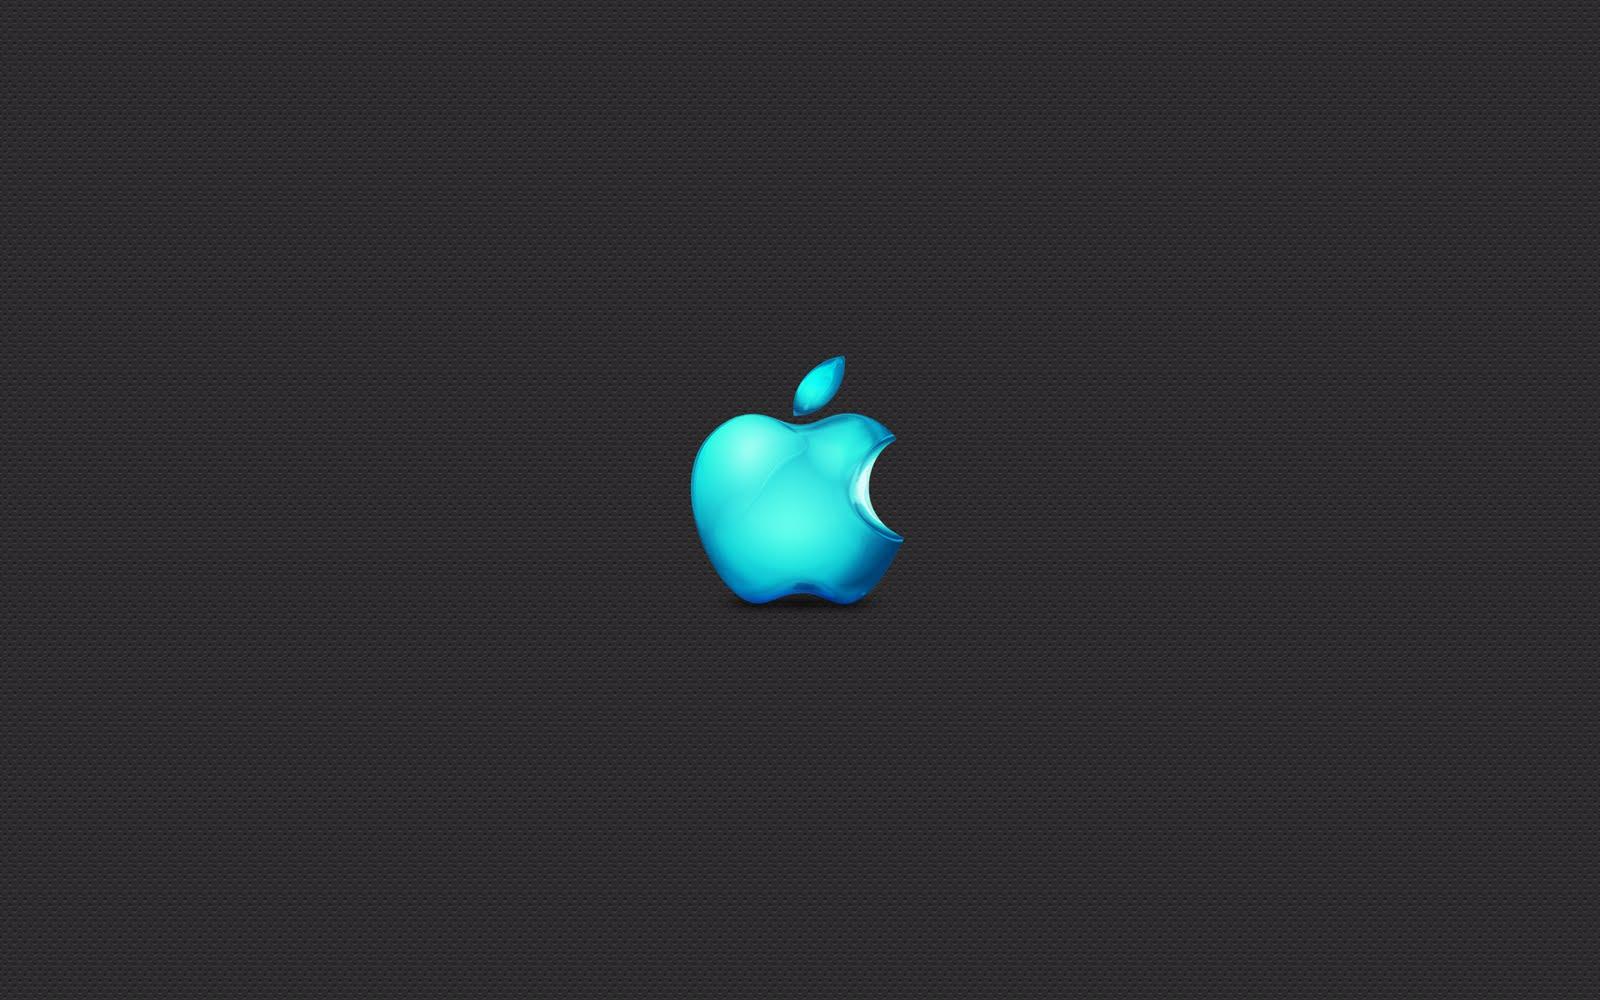 apple logo hd wallpapers hd wallpapers